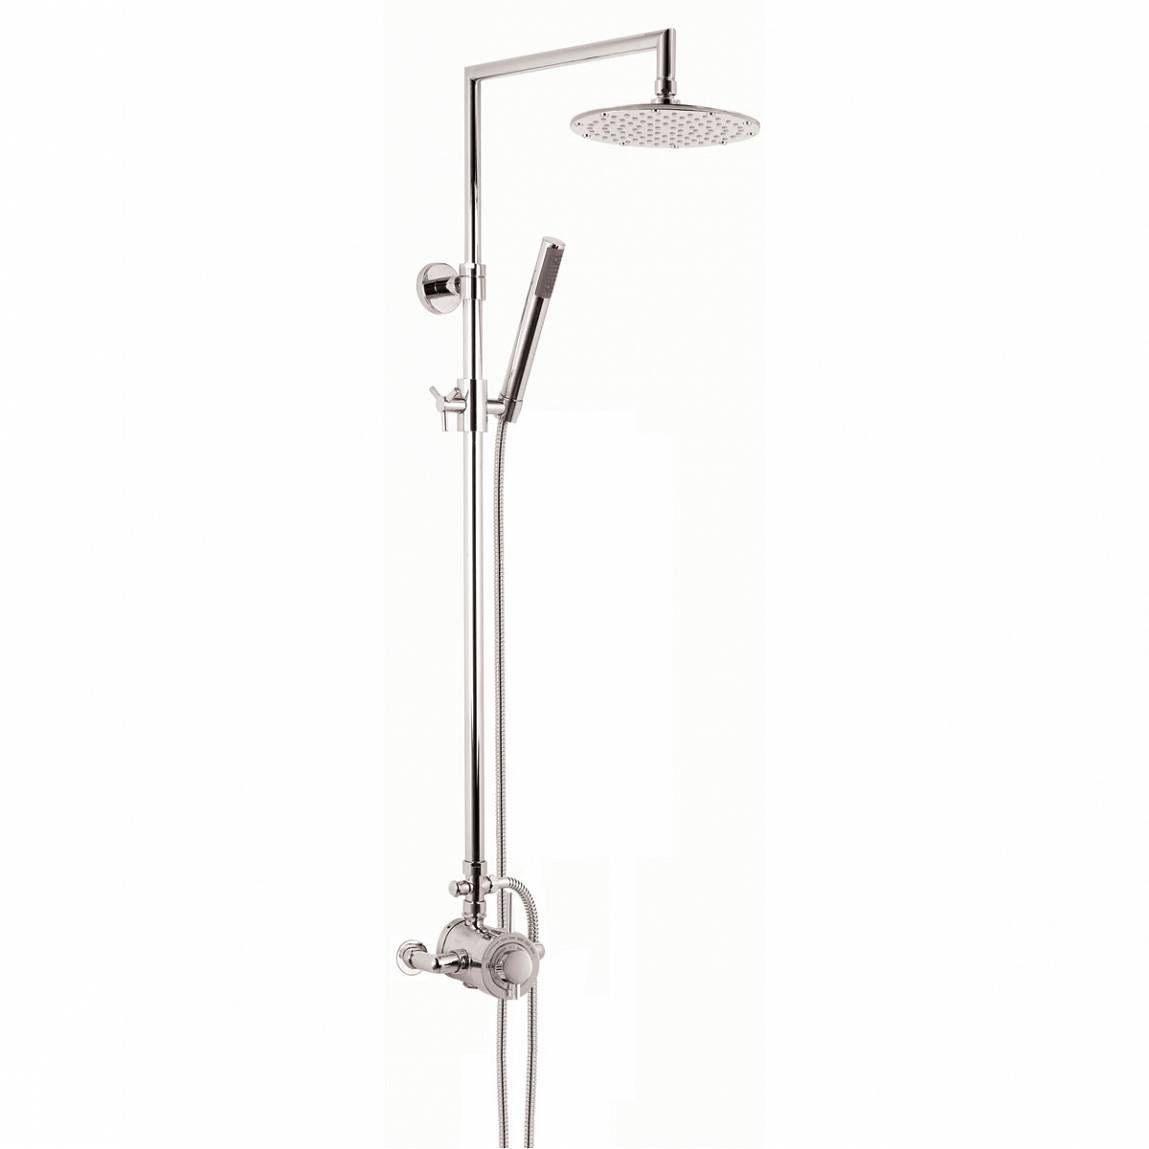 Minimalist Waifer Round Riser System | Bathroom ideas | Pinterest ...